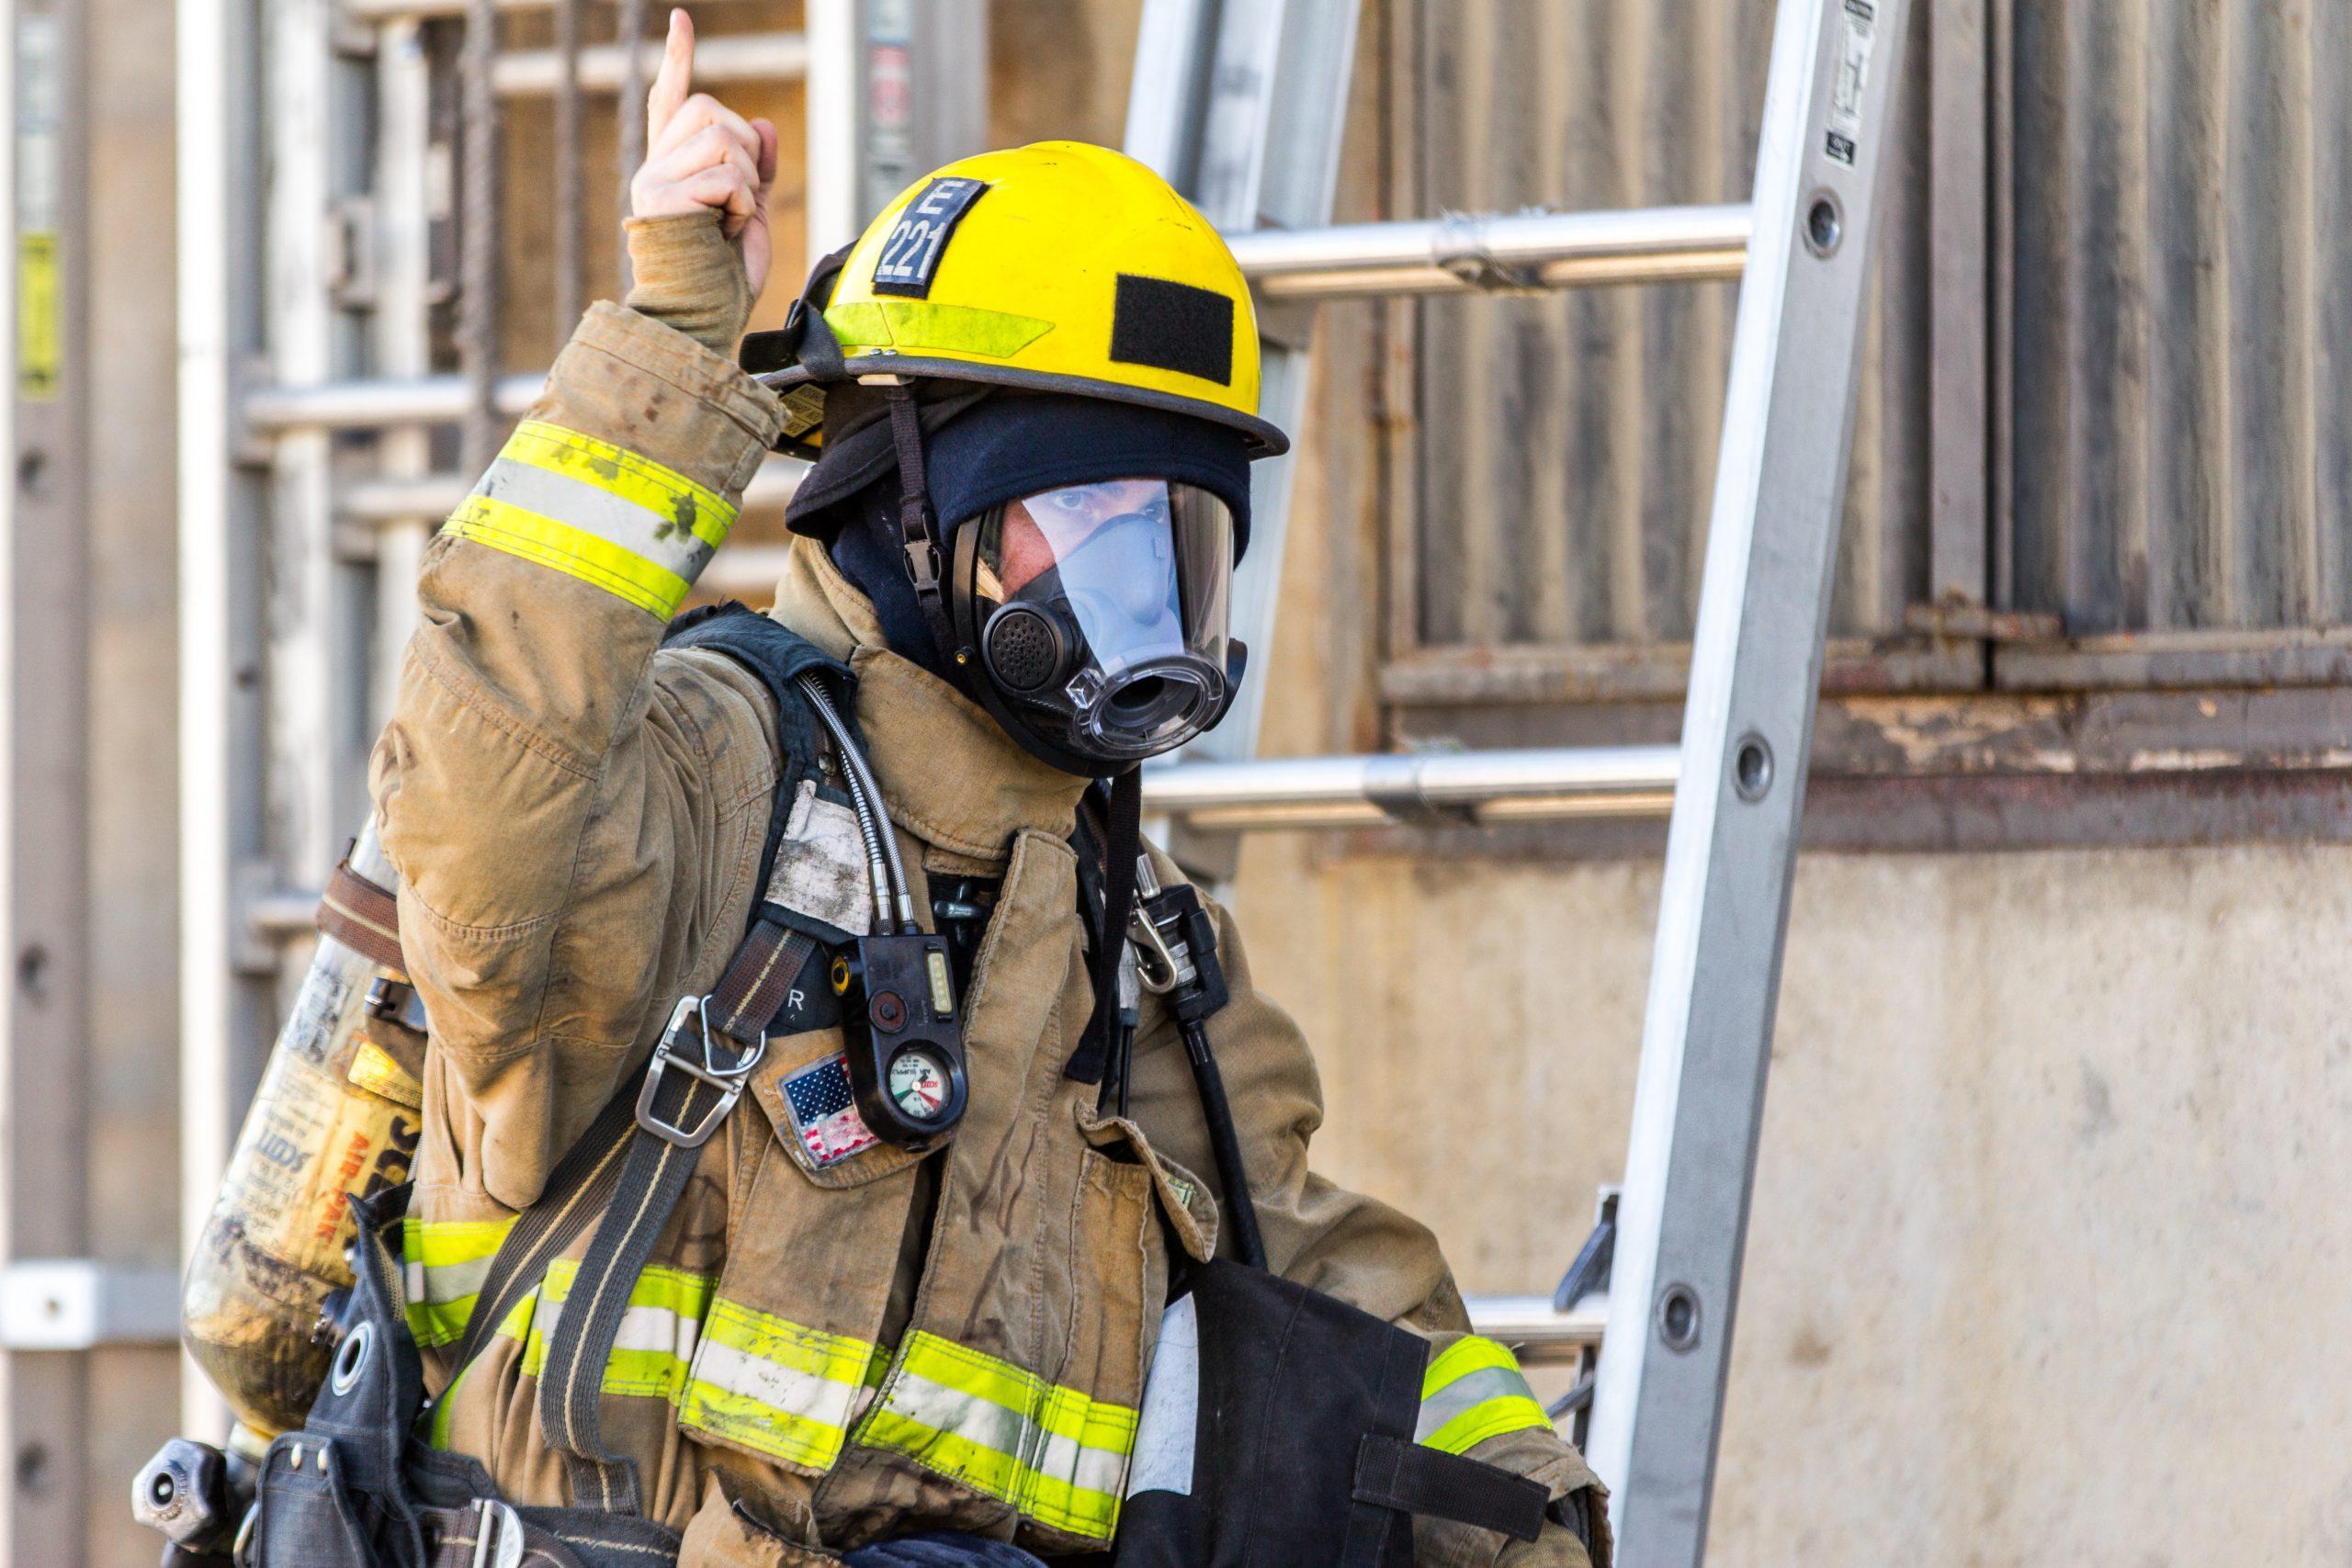 First responder communication